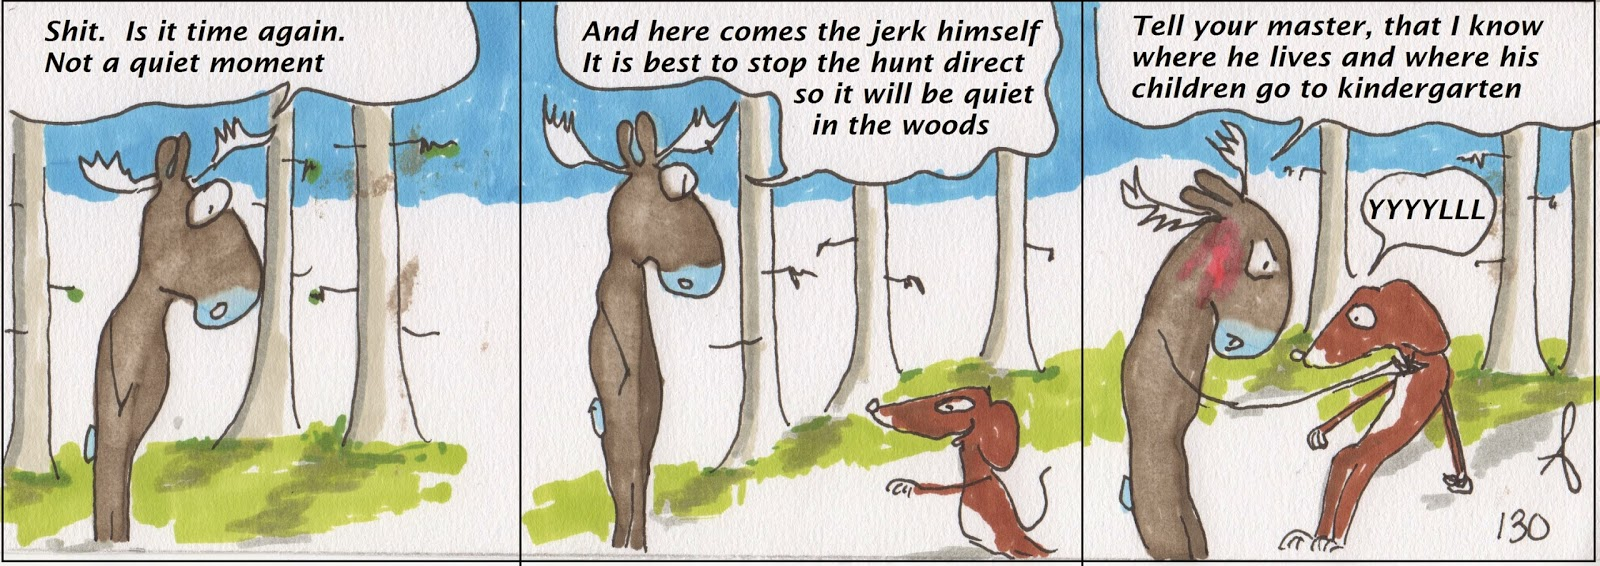 Moose & Molly Comics and Games - seattlepicom